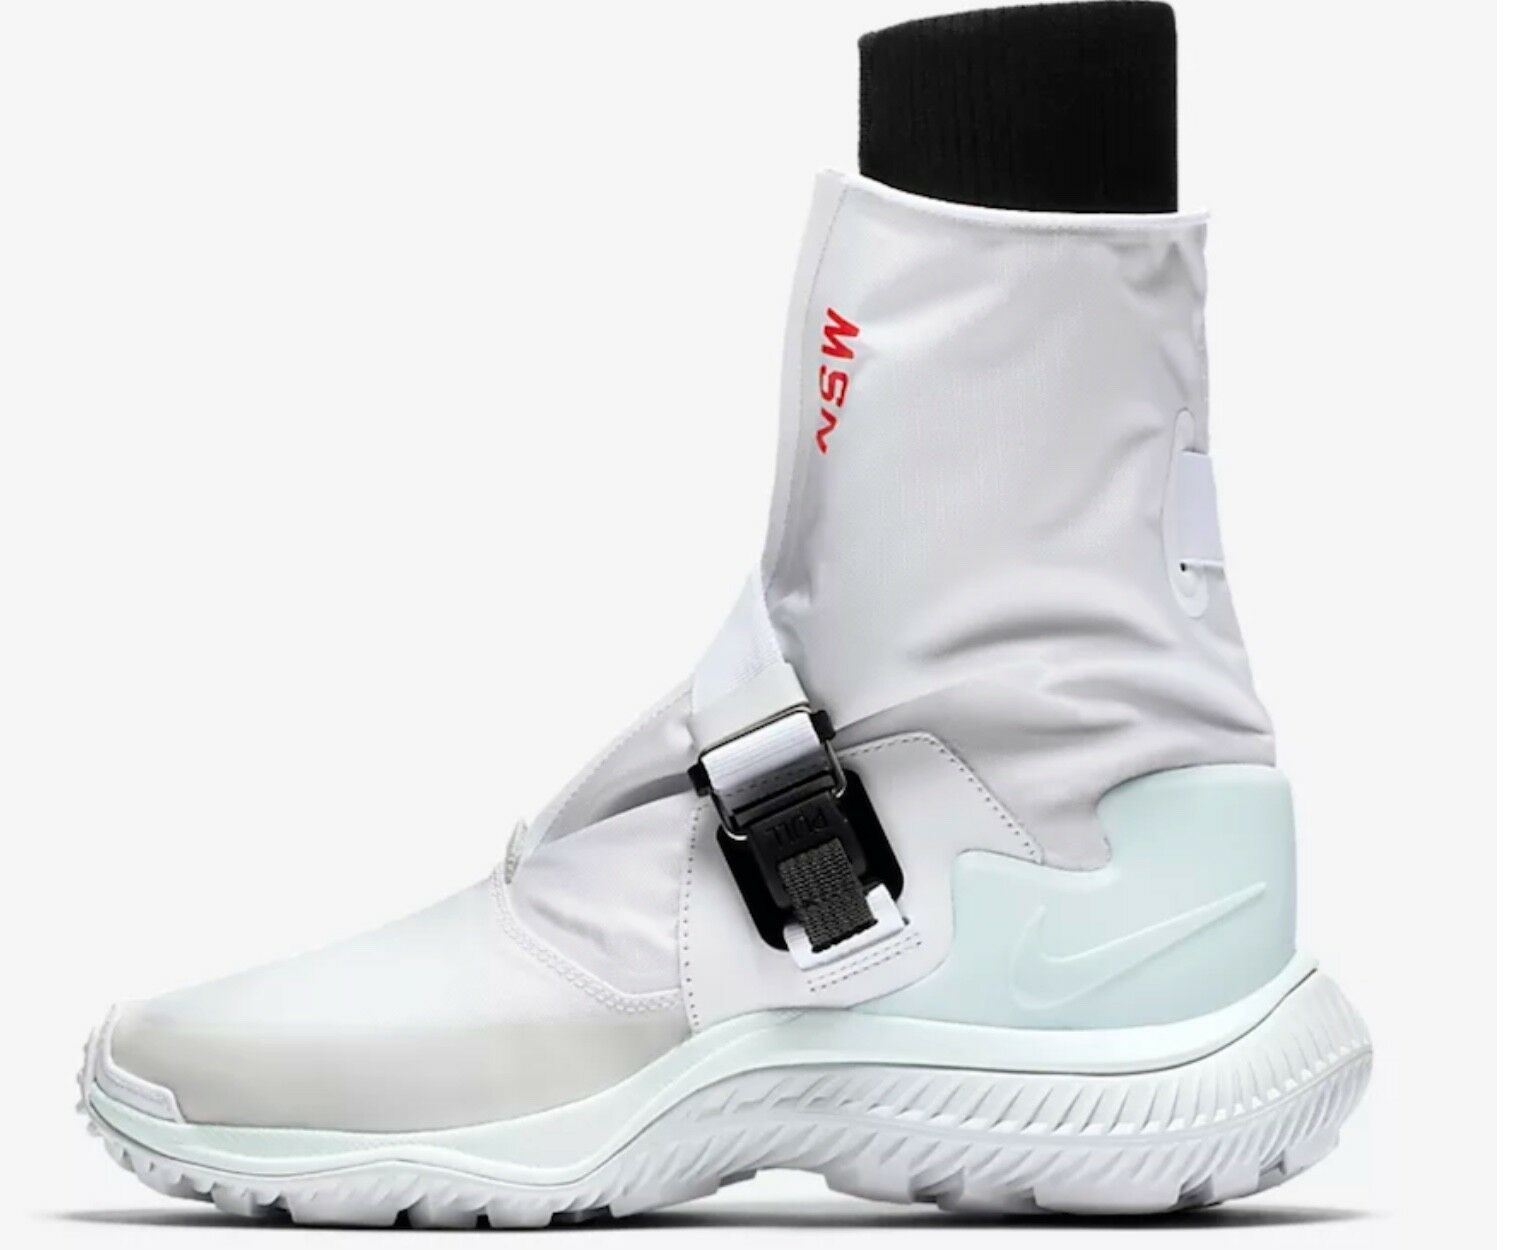 Nike NikeLab Wmns NSW Ghetta avvio Bianco verde d'orzo AA0528-100 UK7.5 US10